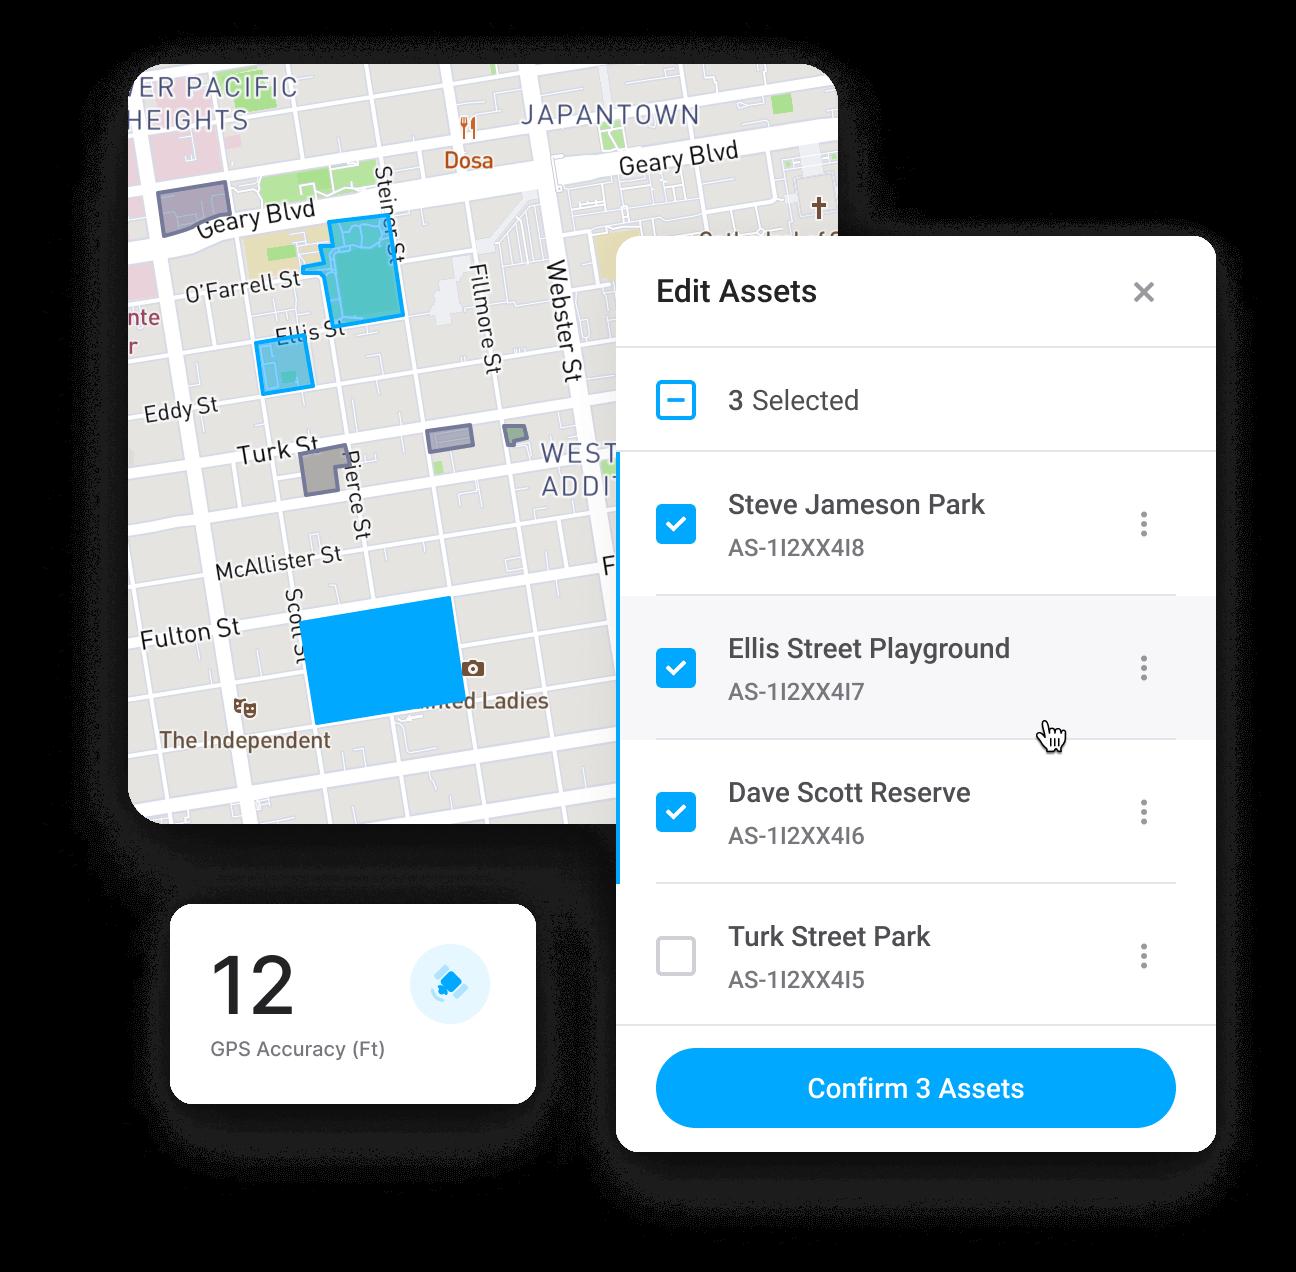 Location Data Switching